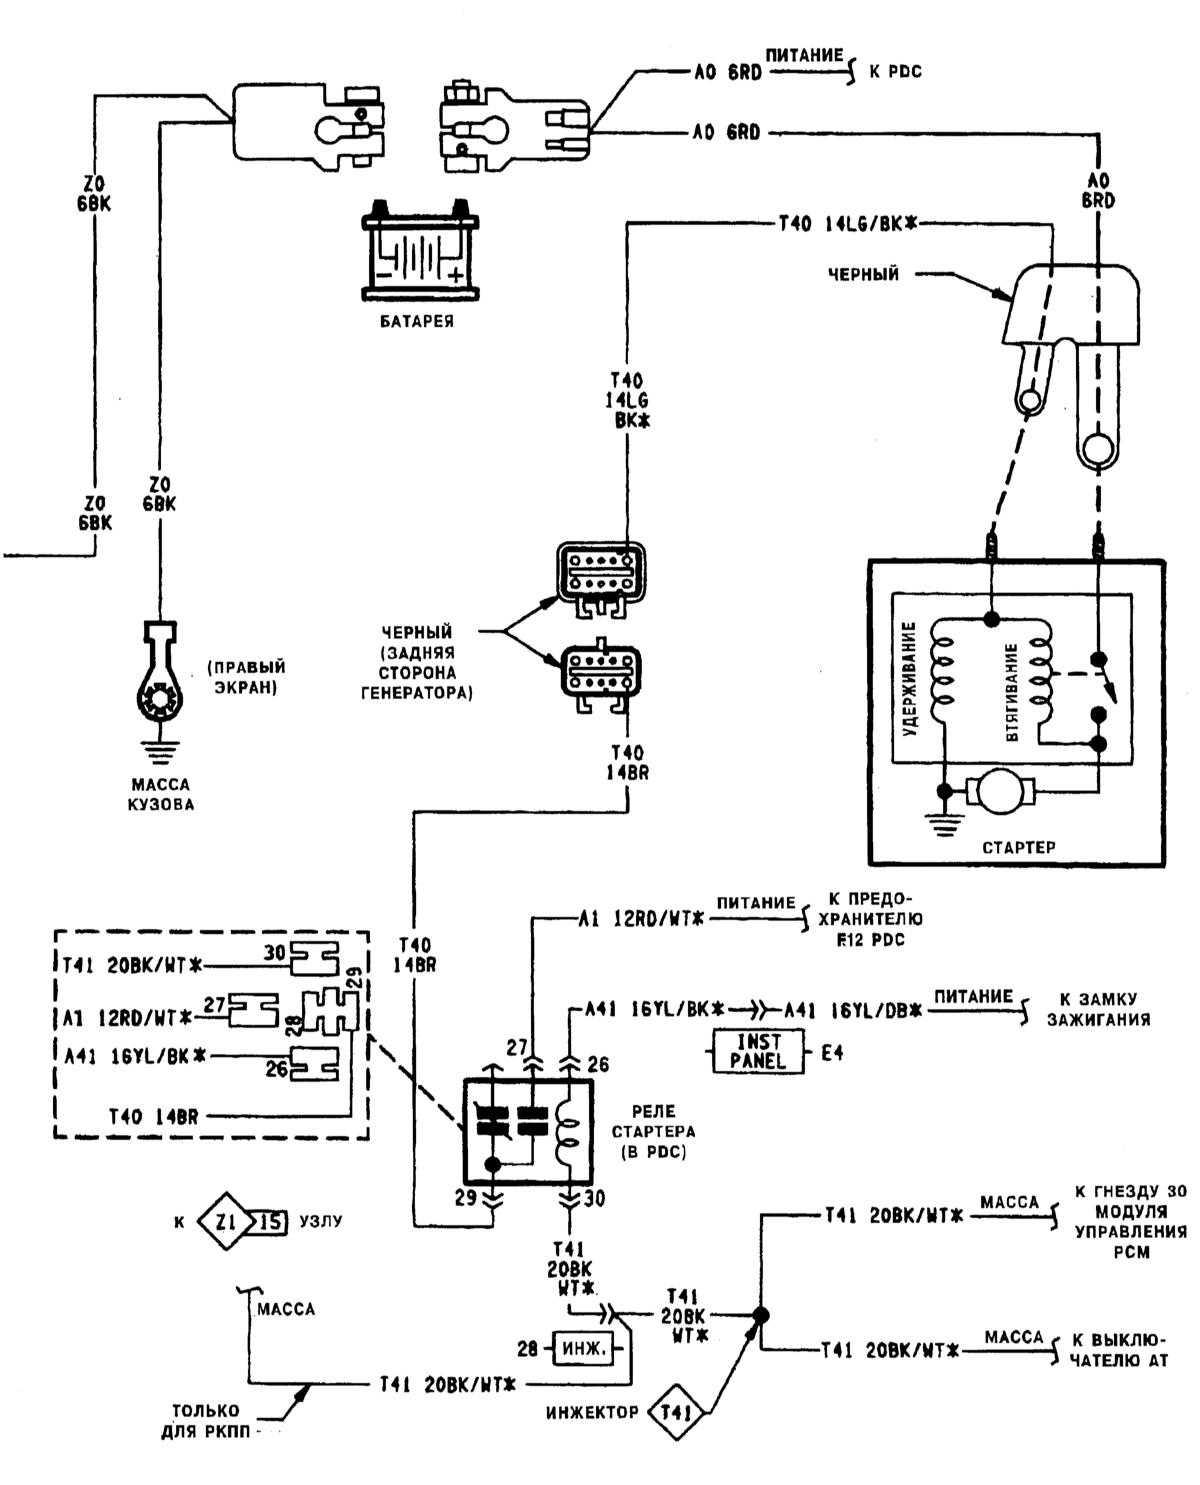 принципиальная схема субару импреза 96 год